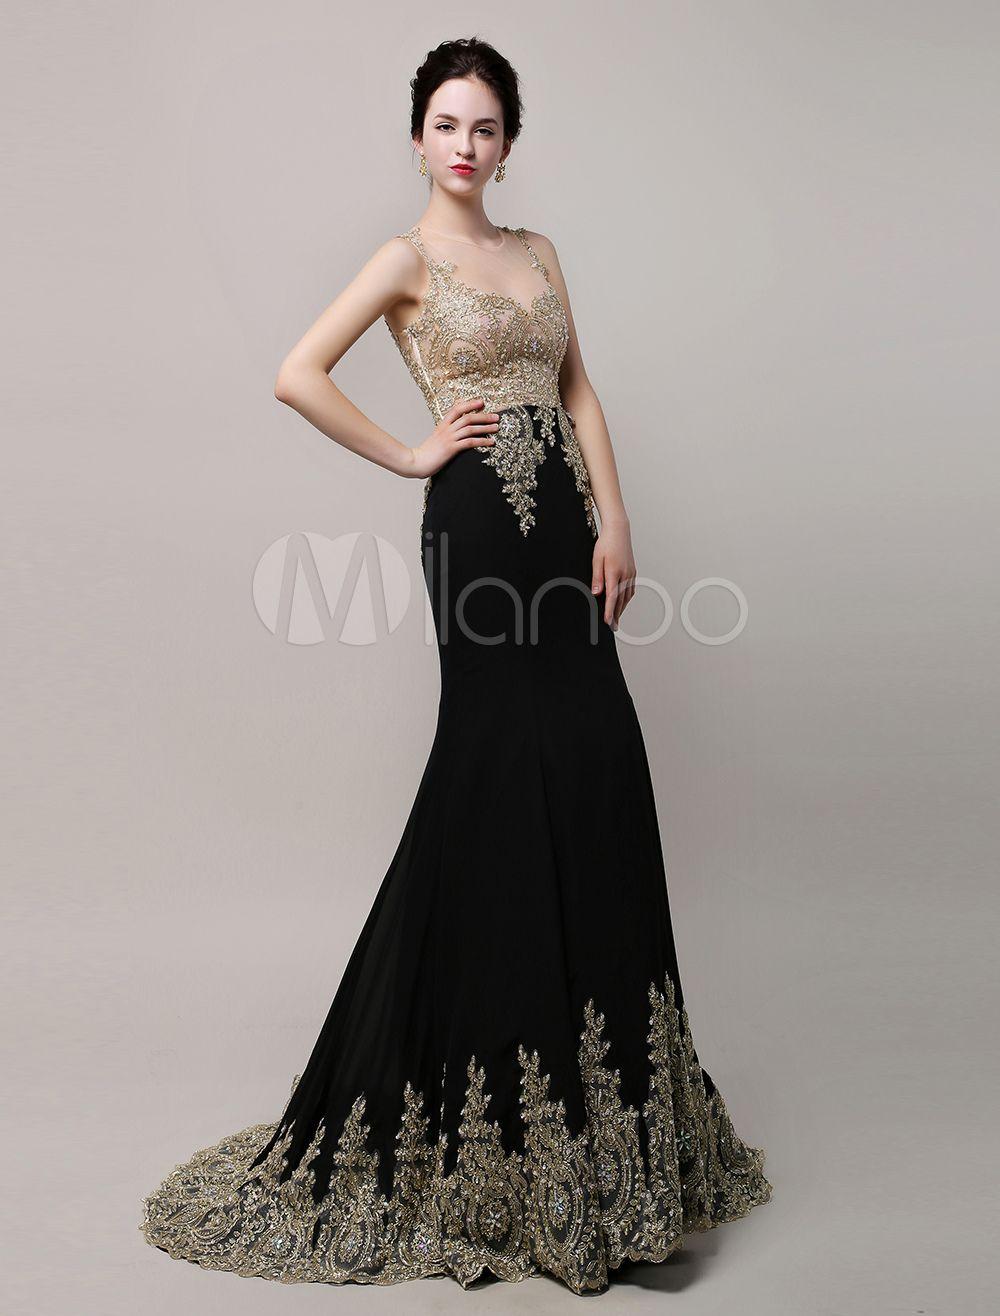 cd9f8d6f4 Impresionante negro boda vestido vestido de noche gasa apliques oro sirena  ilusión corpiño de novia